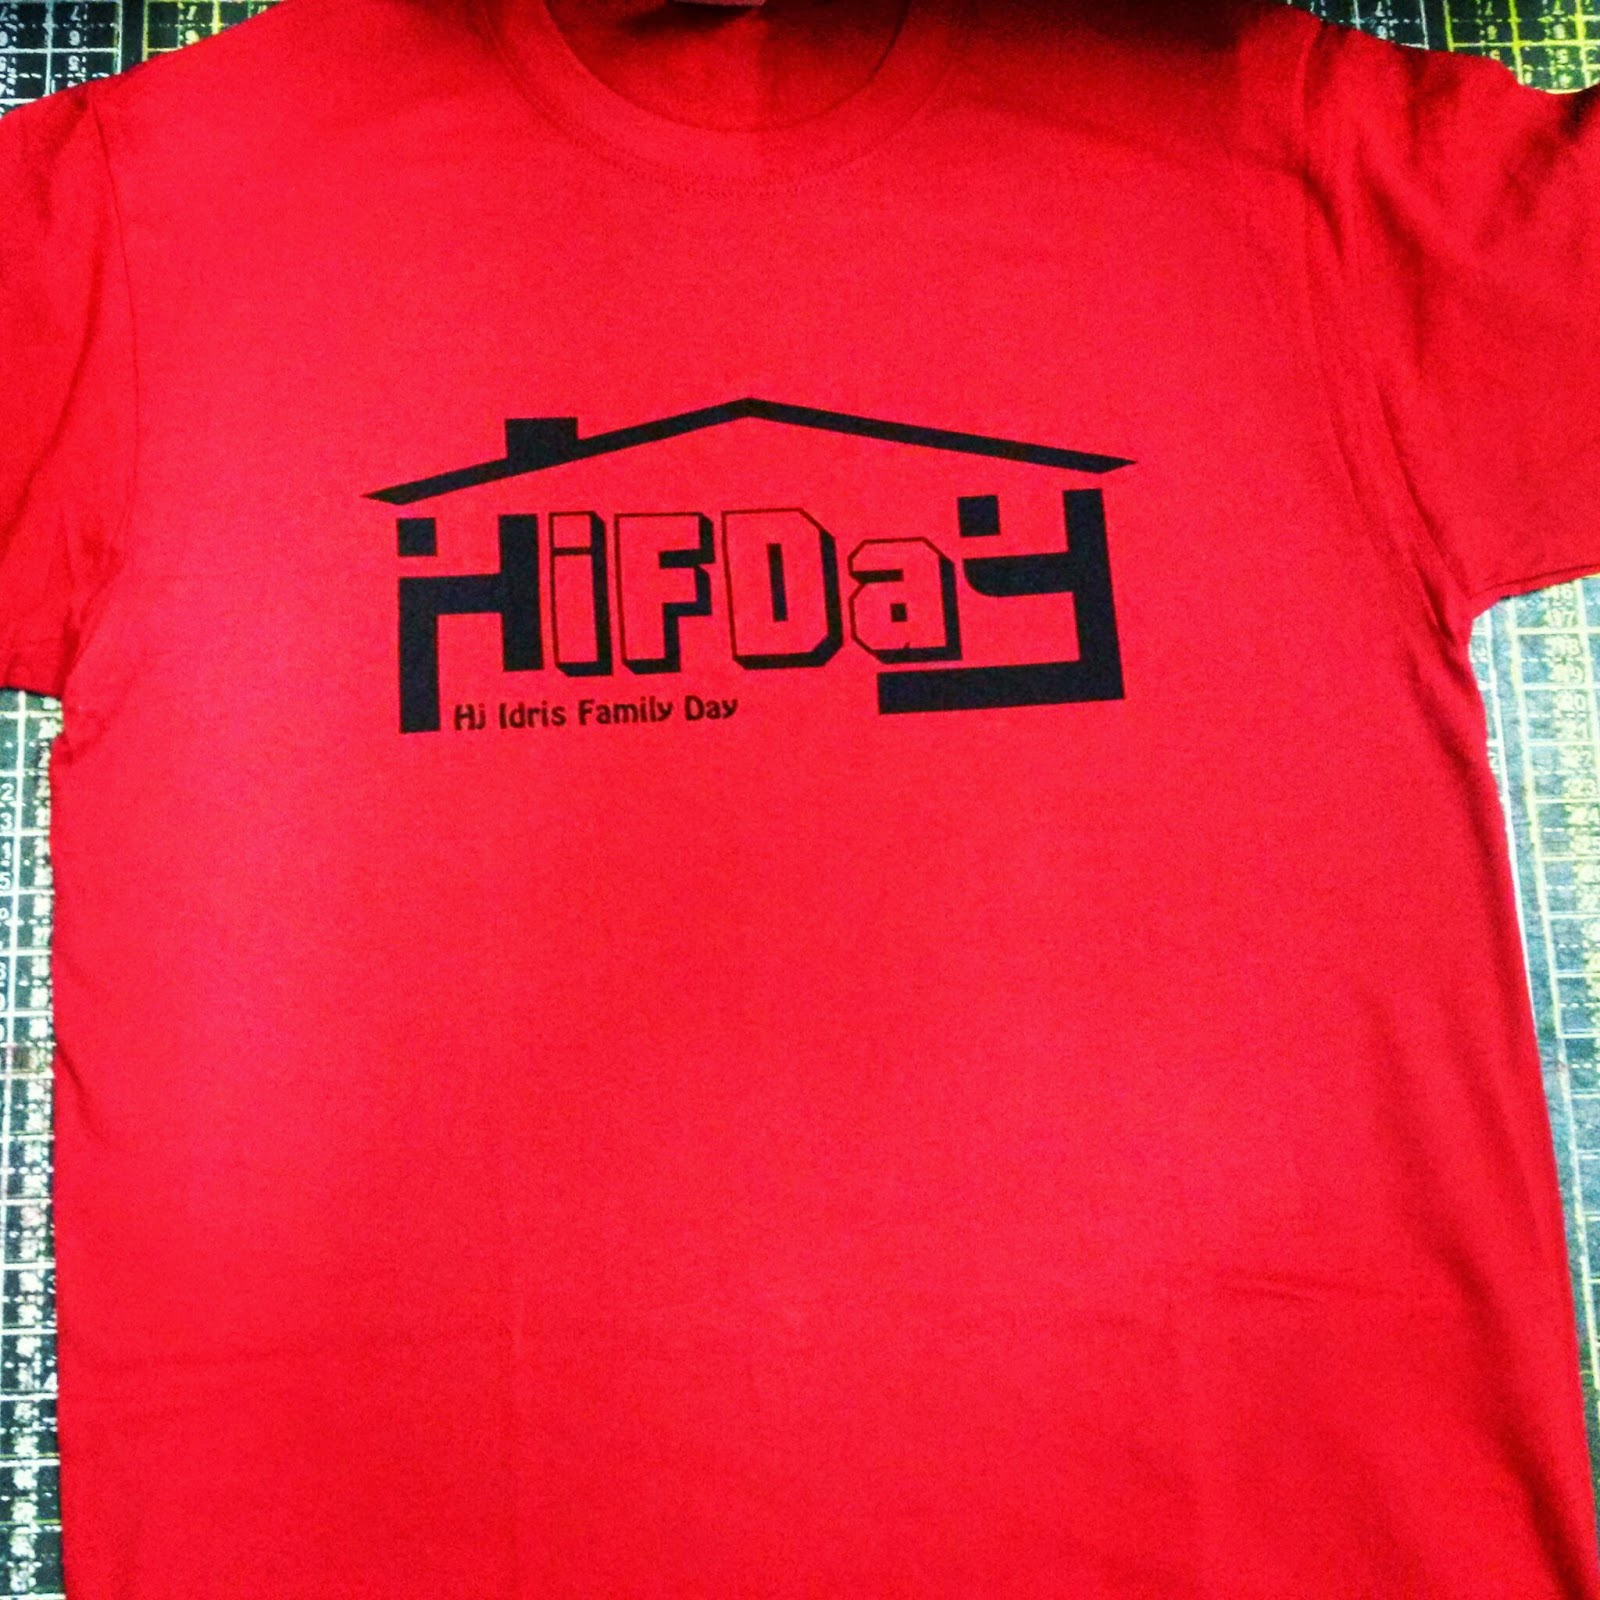 Contoh design t shirt family day - T Shirt Family Day T Shirt Printing 1colour Depan Atau Belakang Serendah Rm9 90 Your Design We Do Penghantaran Disediakan Ke Seluruh Malaysia